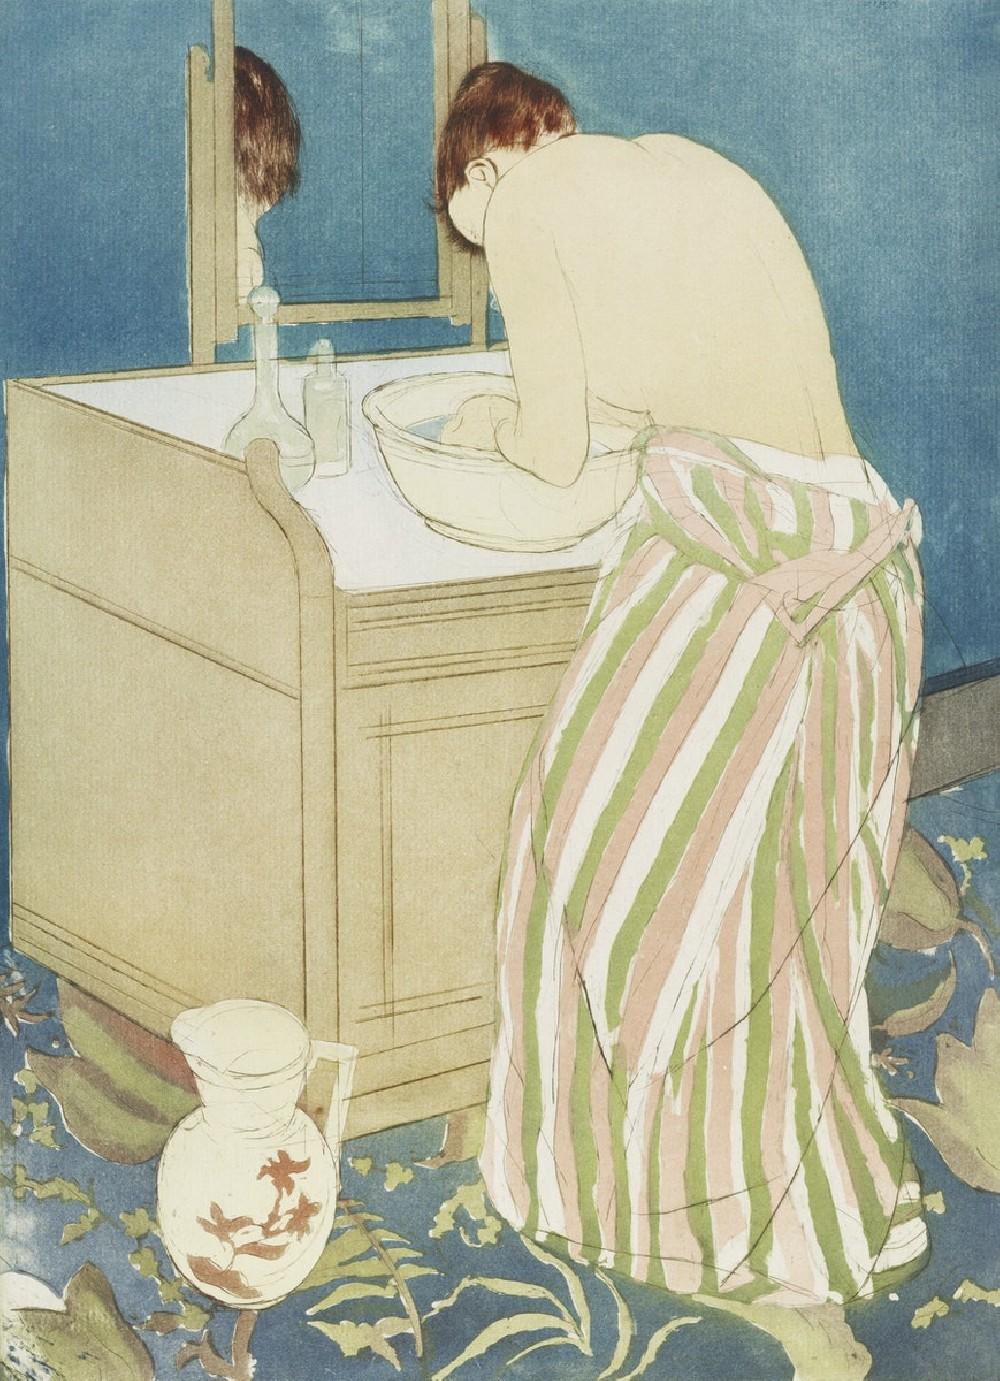 Woman Bathing illustration